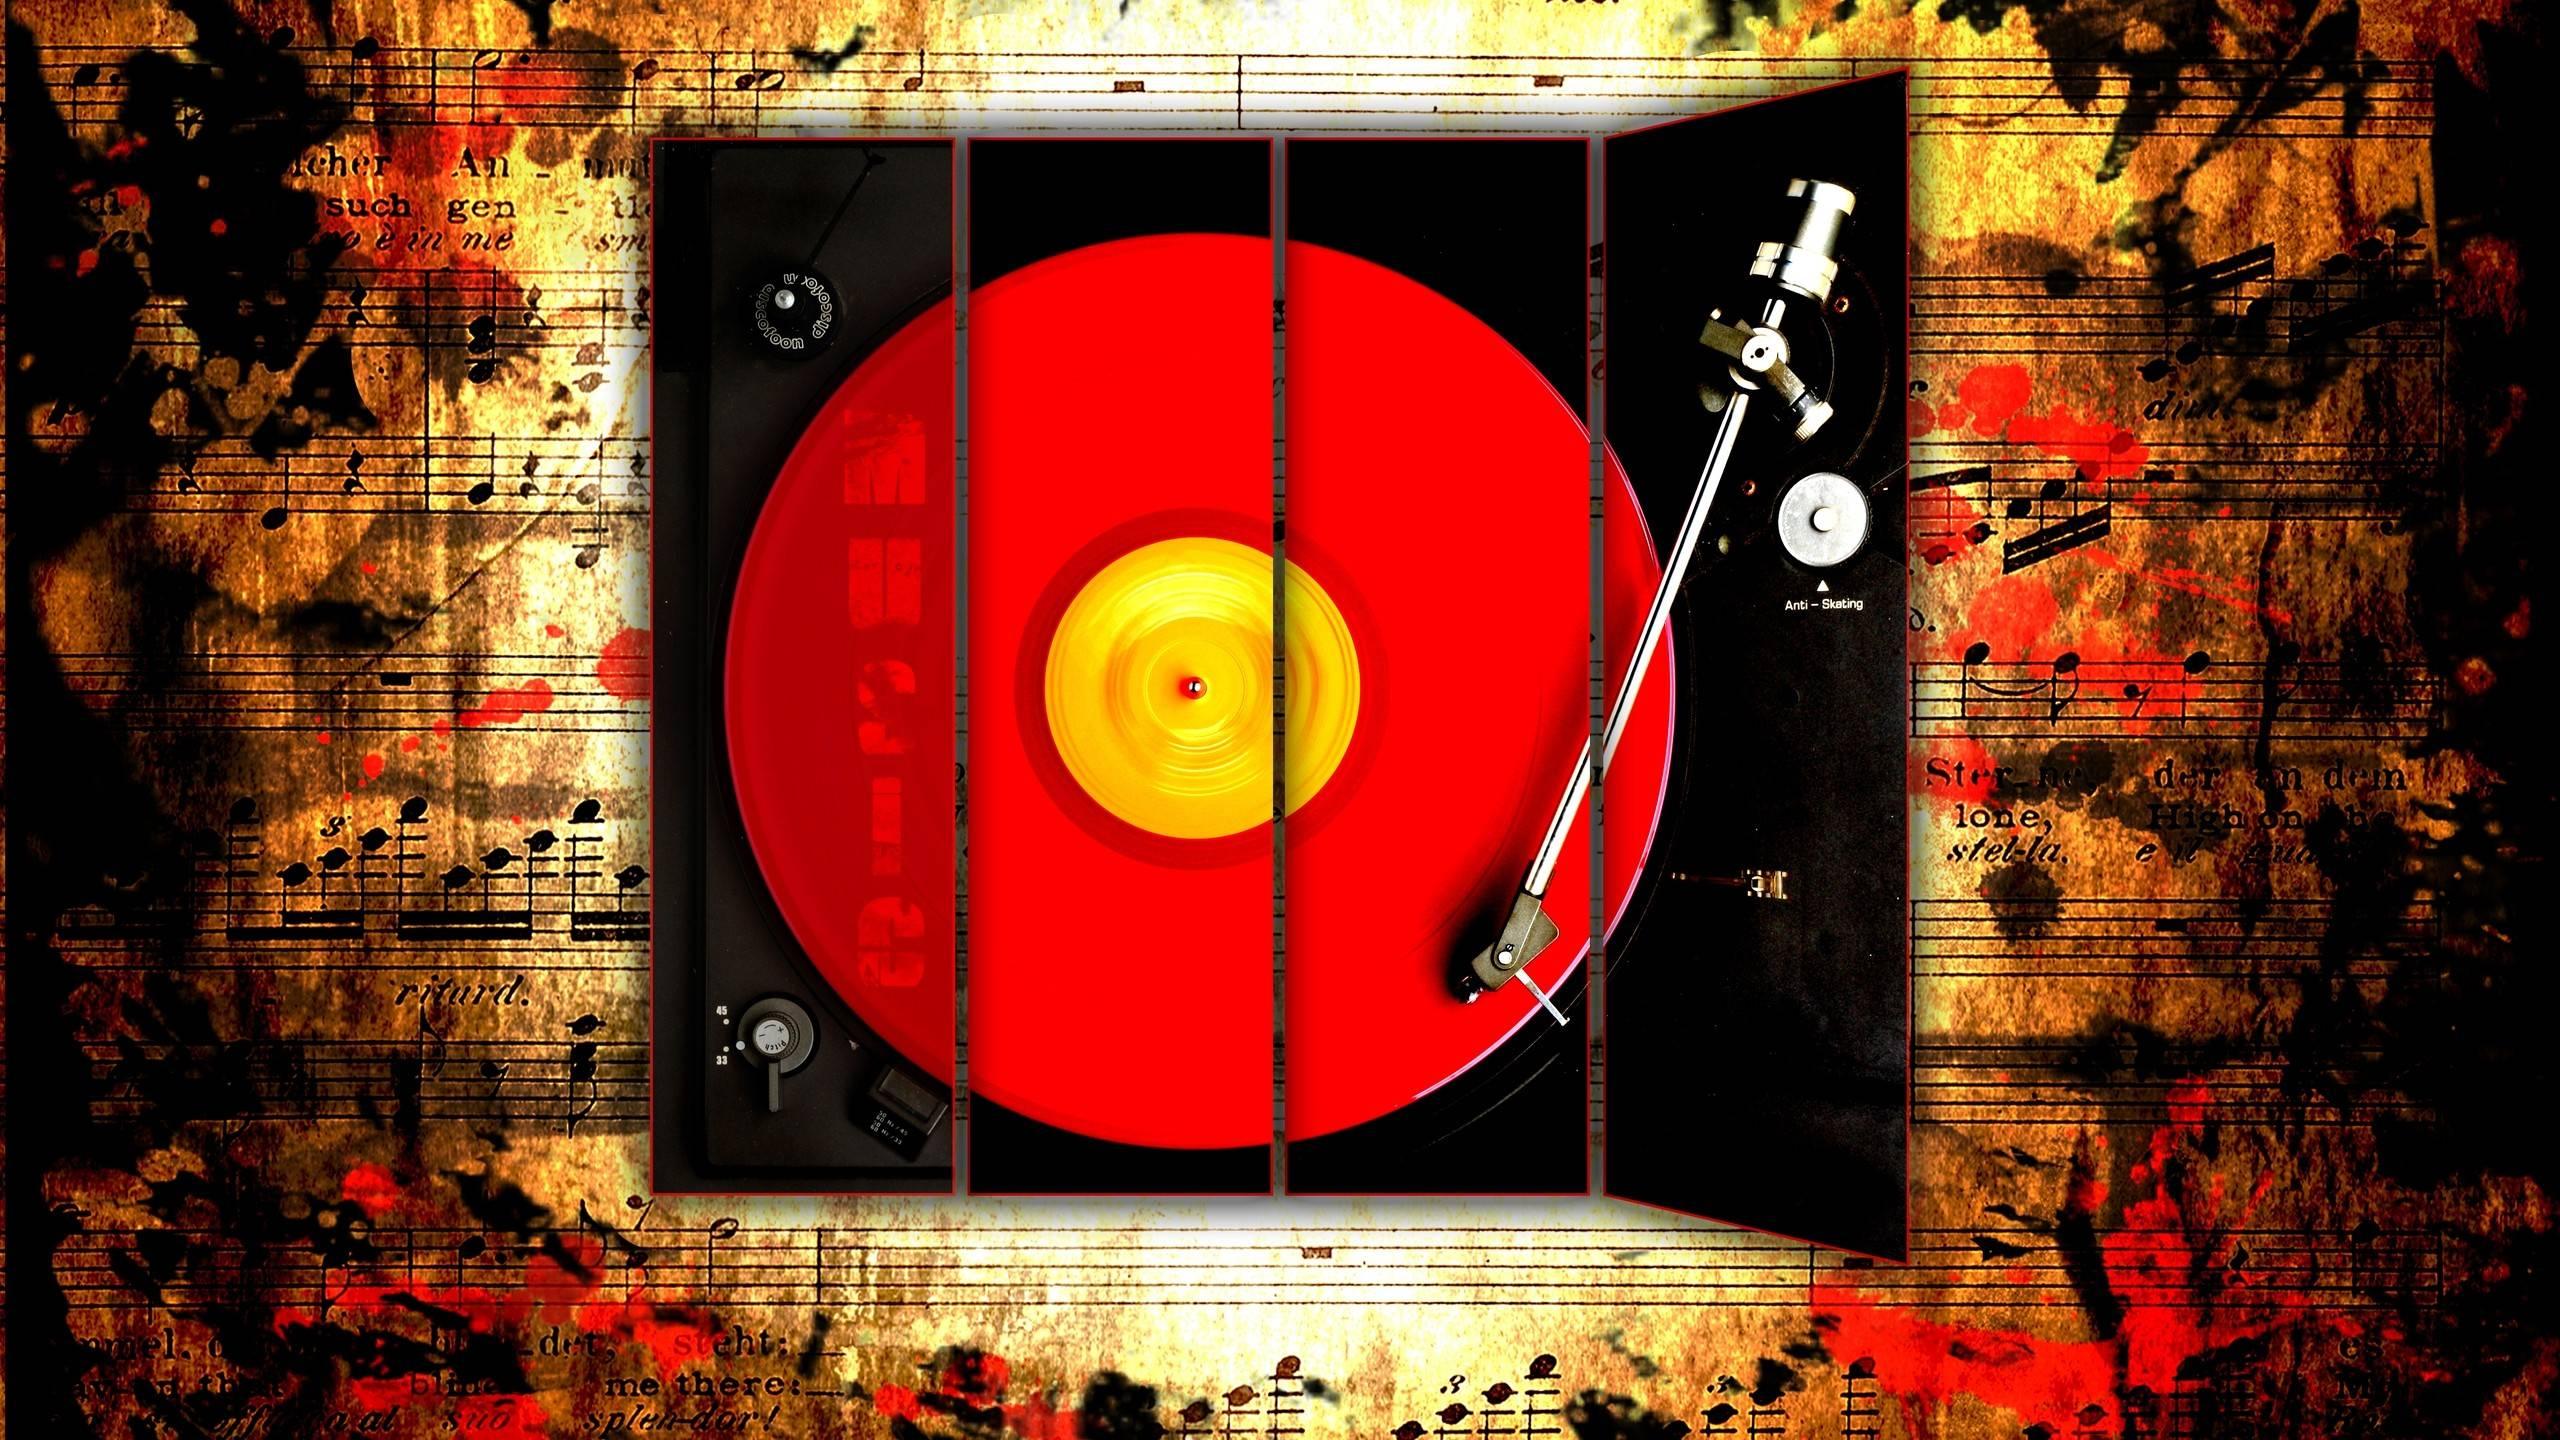 Music Vintage 25602151440 Wallpaper 1653743 2560x1440